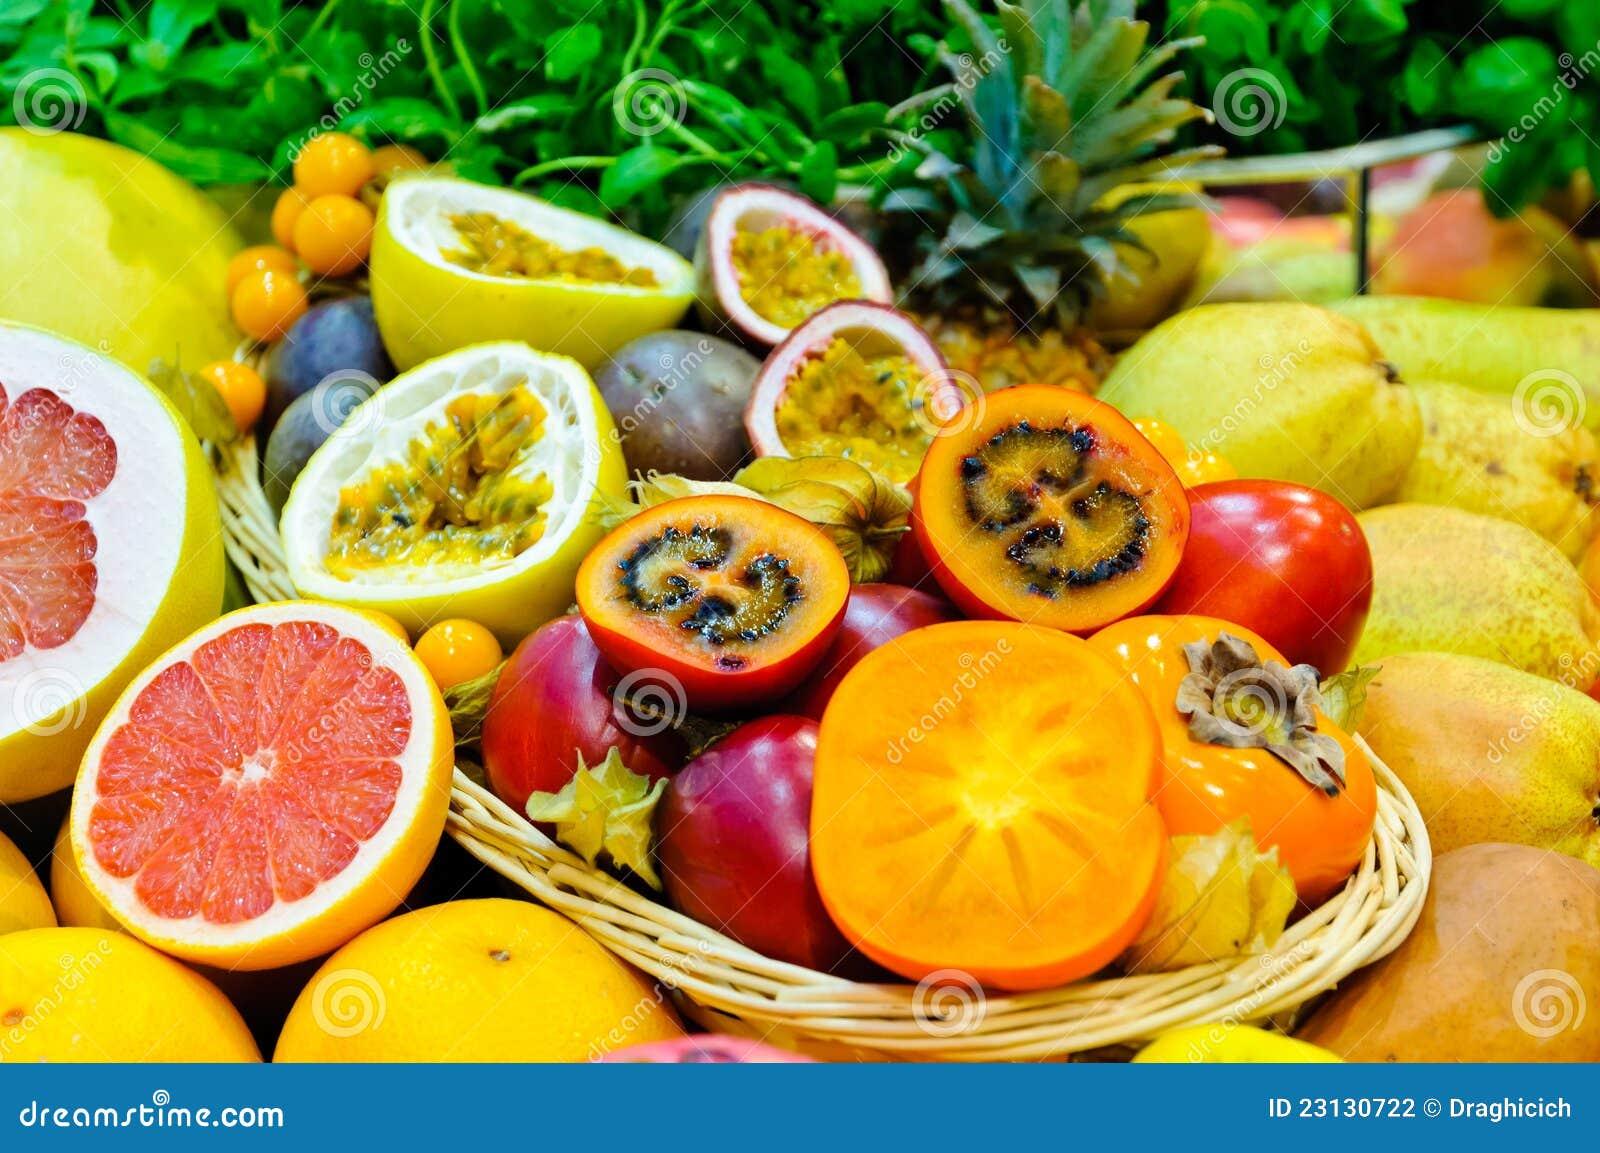 Fruits exotiques photo stock image du tropical - Image fruit exotique ...